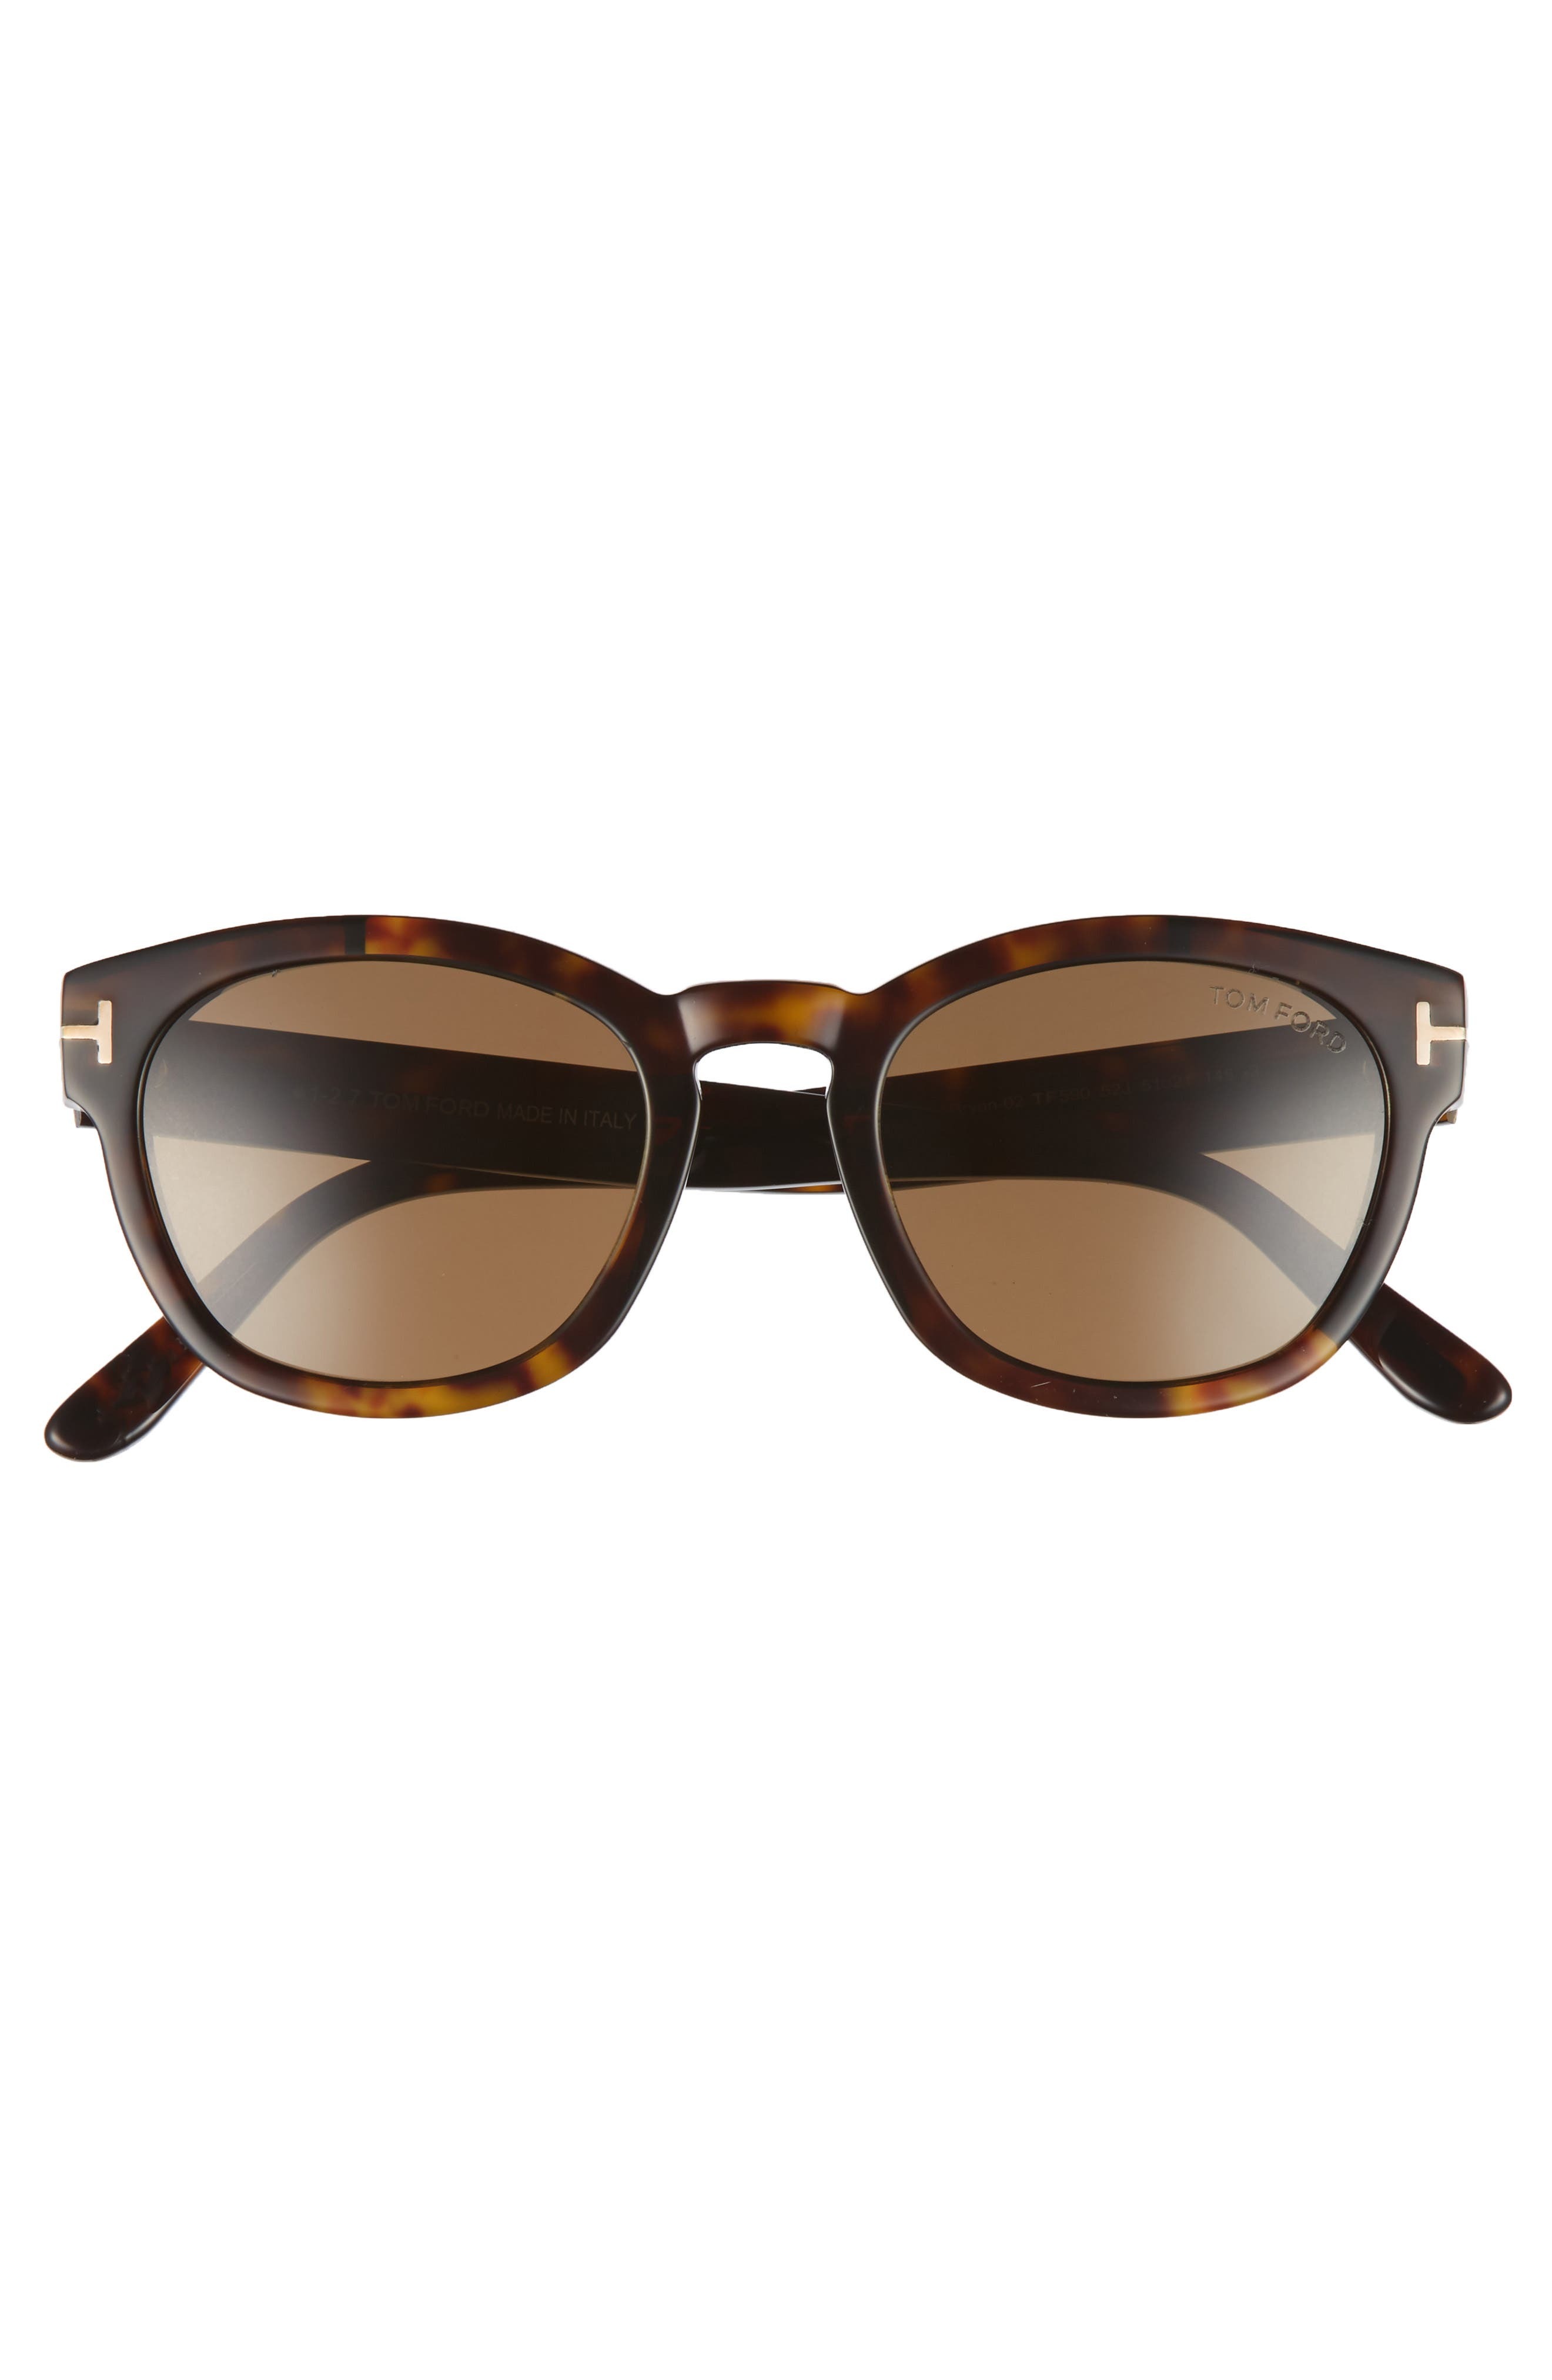 Bryan 51mm Sunglasses,                             Alternate thumbnail 2, color,                             DARK HAVANA/ ROVIEX